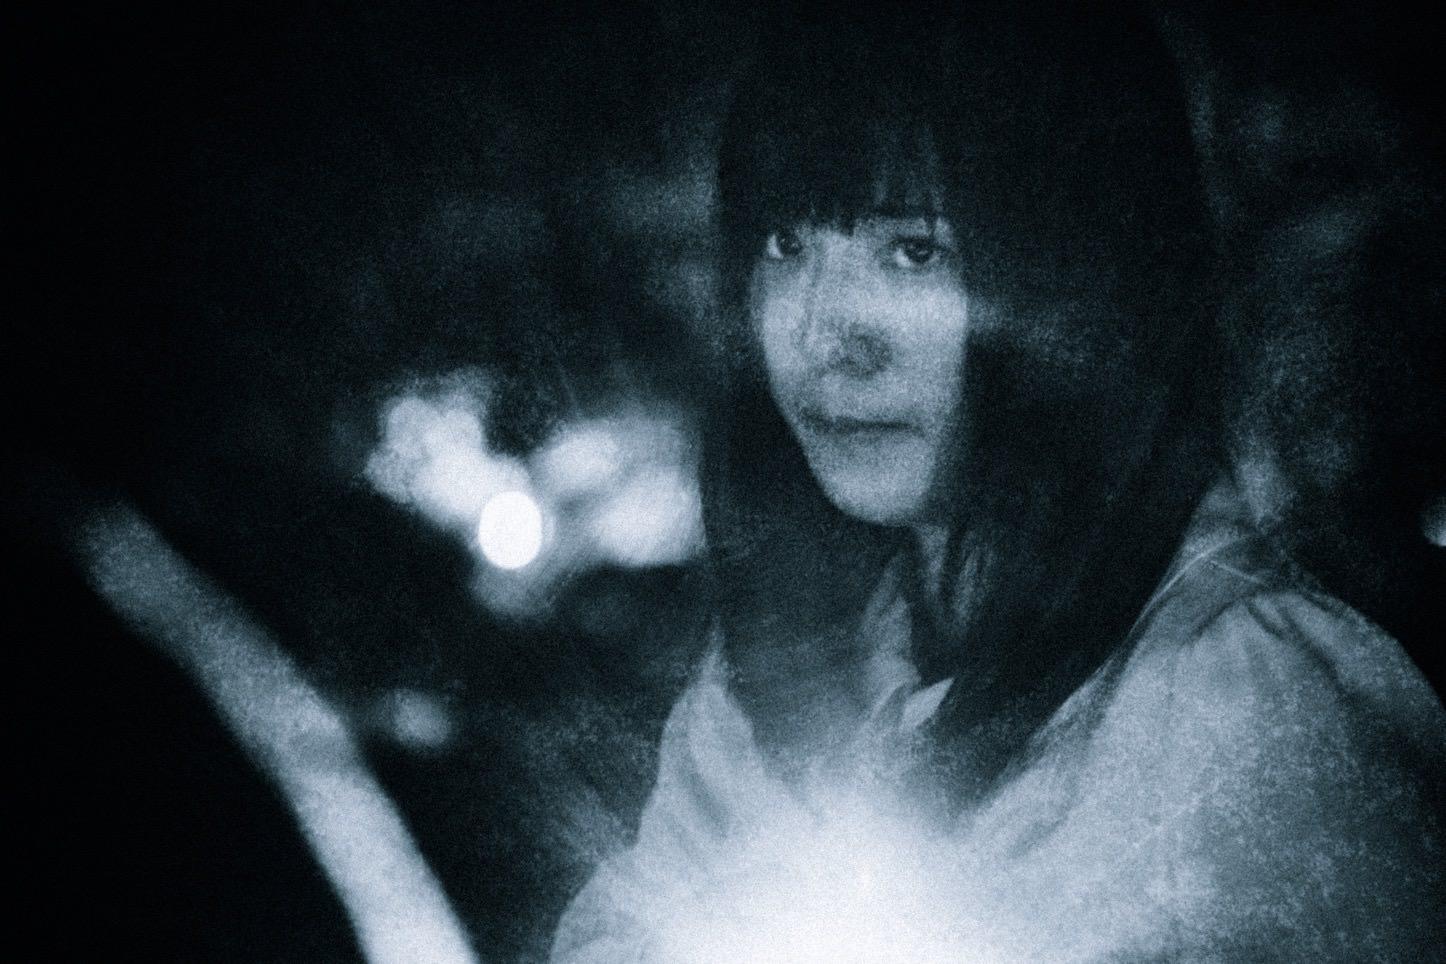 Pakutaso-Horror-Free-Stock-Photos-30.jpg